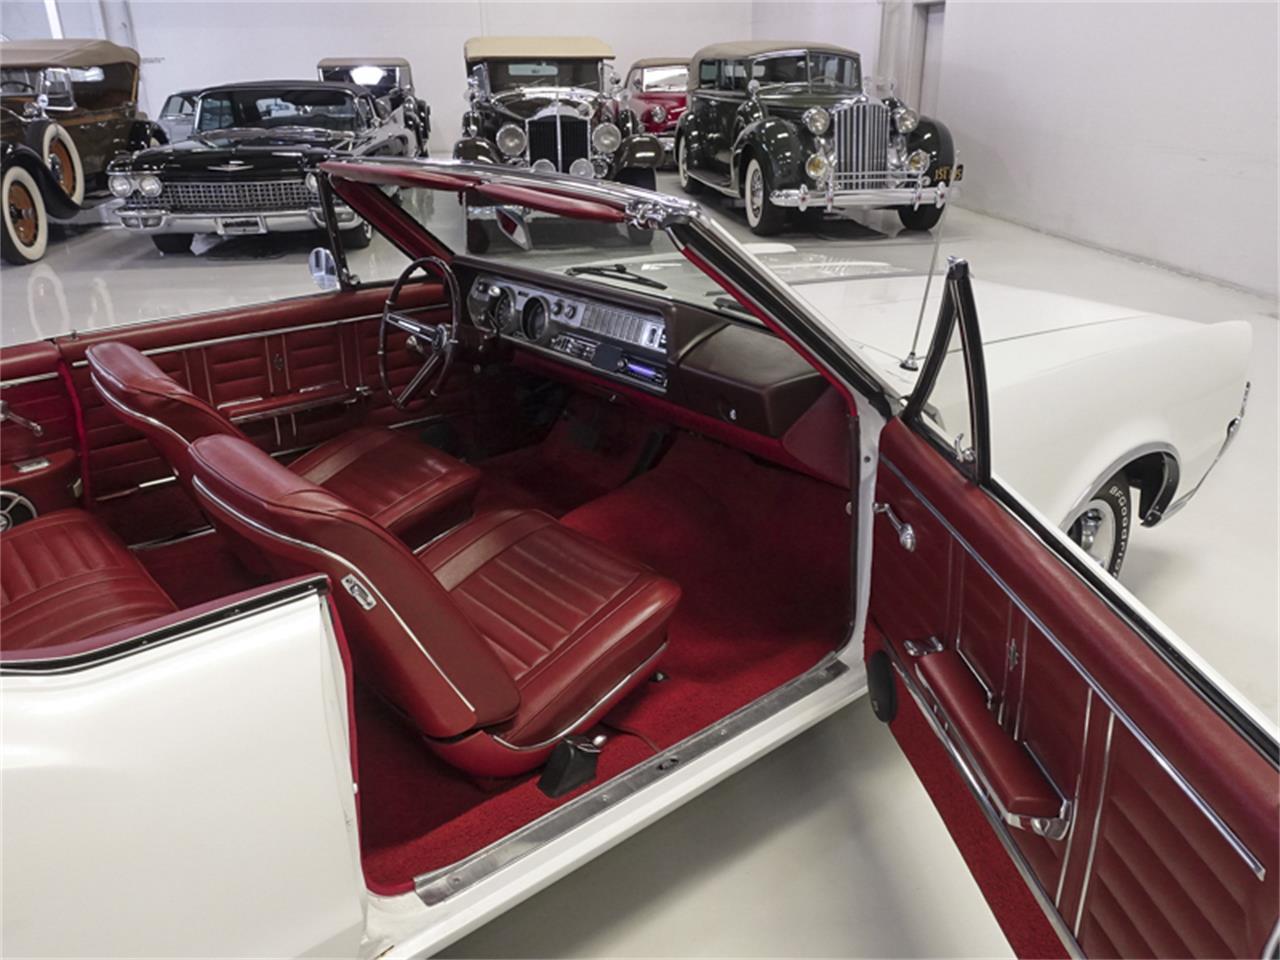 Large Picture of Classic '67 Cutlass Supreme located in Missouri Offered by Daniel Schmitt & Co. - QK0F